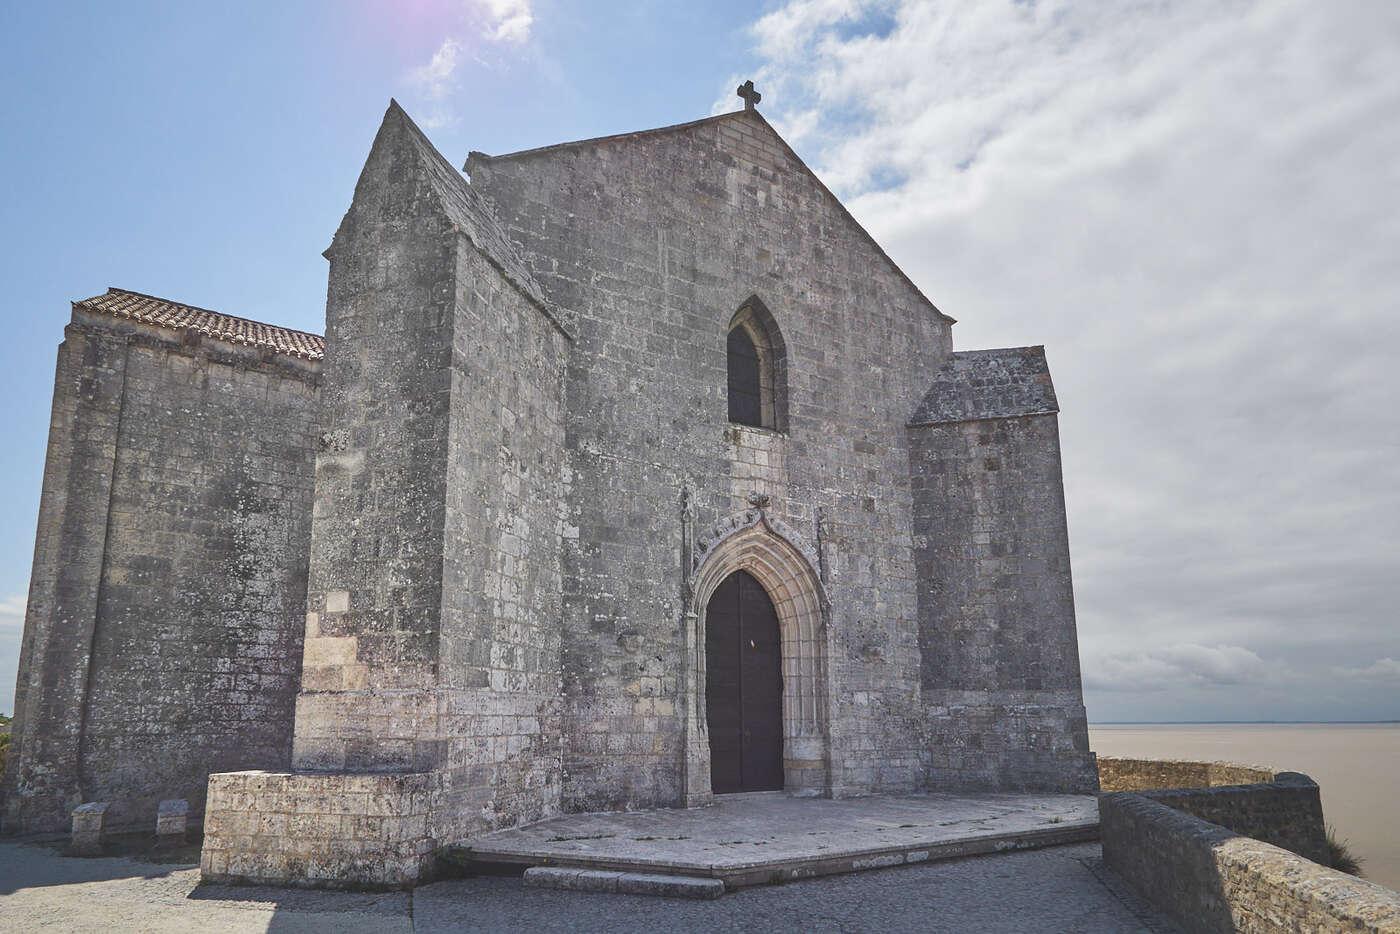 Eglise Sainte Radegonde de Talmont-sur-Gironde